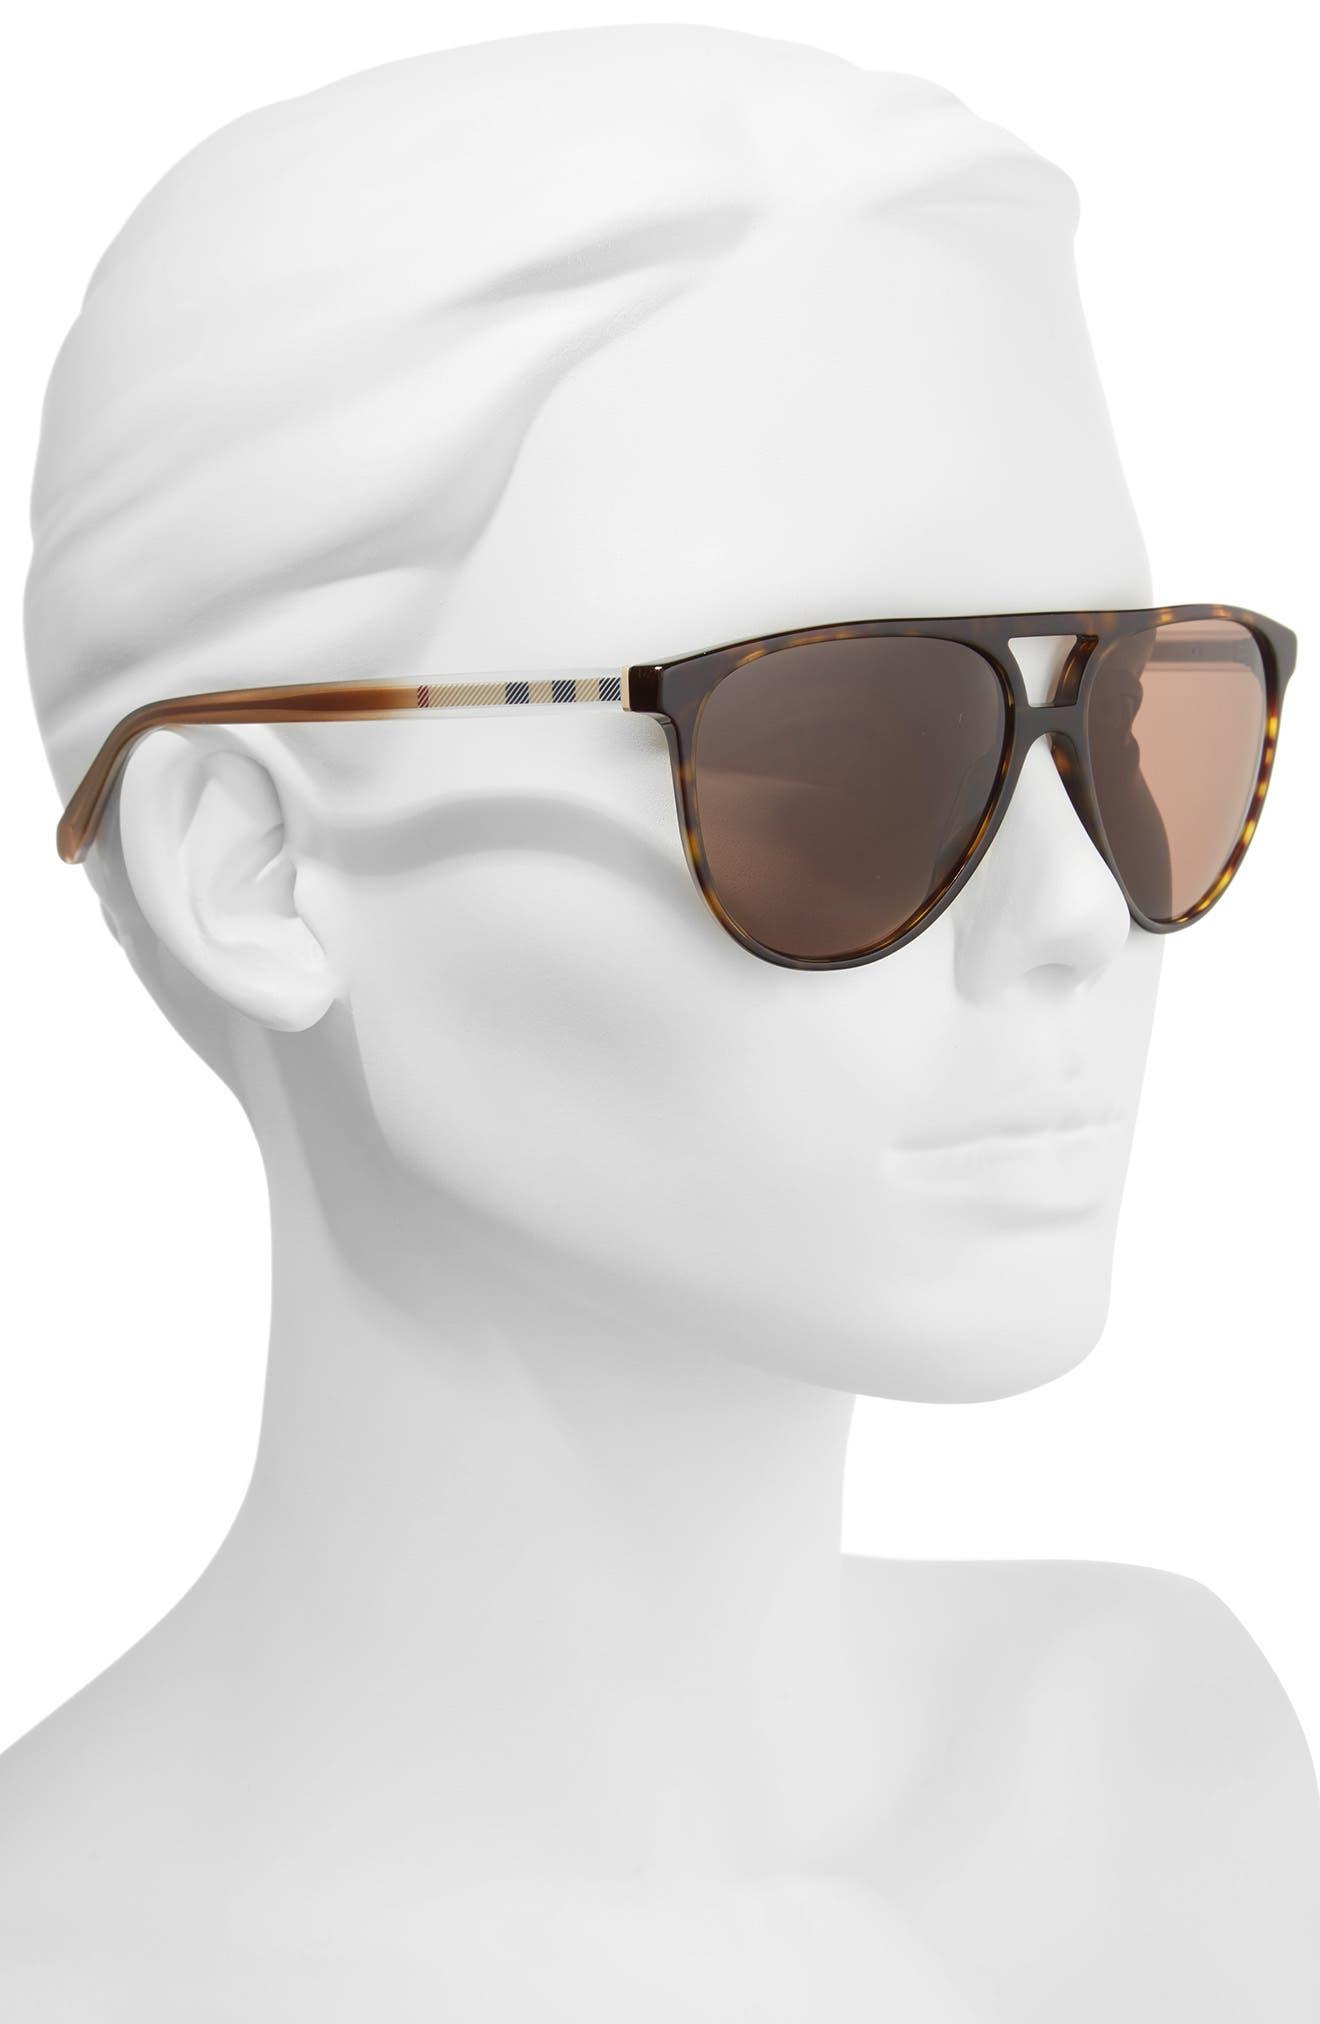 58mm Aviator Sunglasses,                             Alternate thumbnail 2, color,